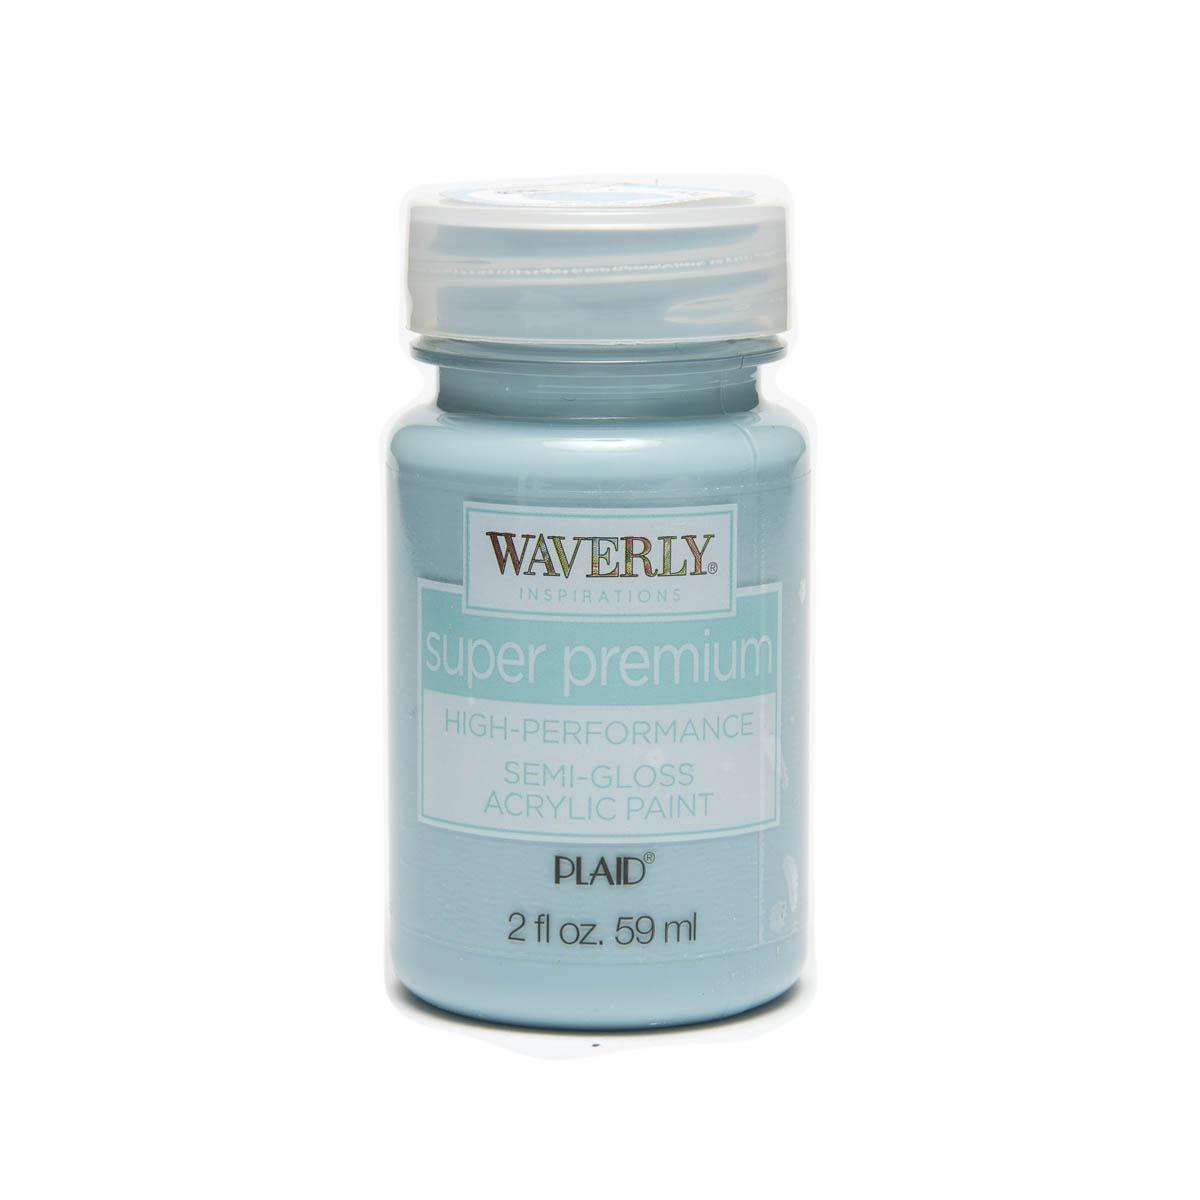 Waverly ® Inspirations Super Premium Semi-Gloss Acrylic Paint - Pool, 2 oz. - 60635E